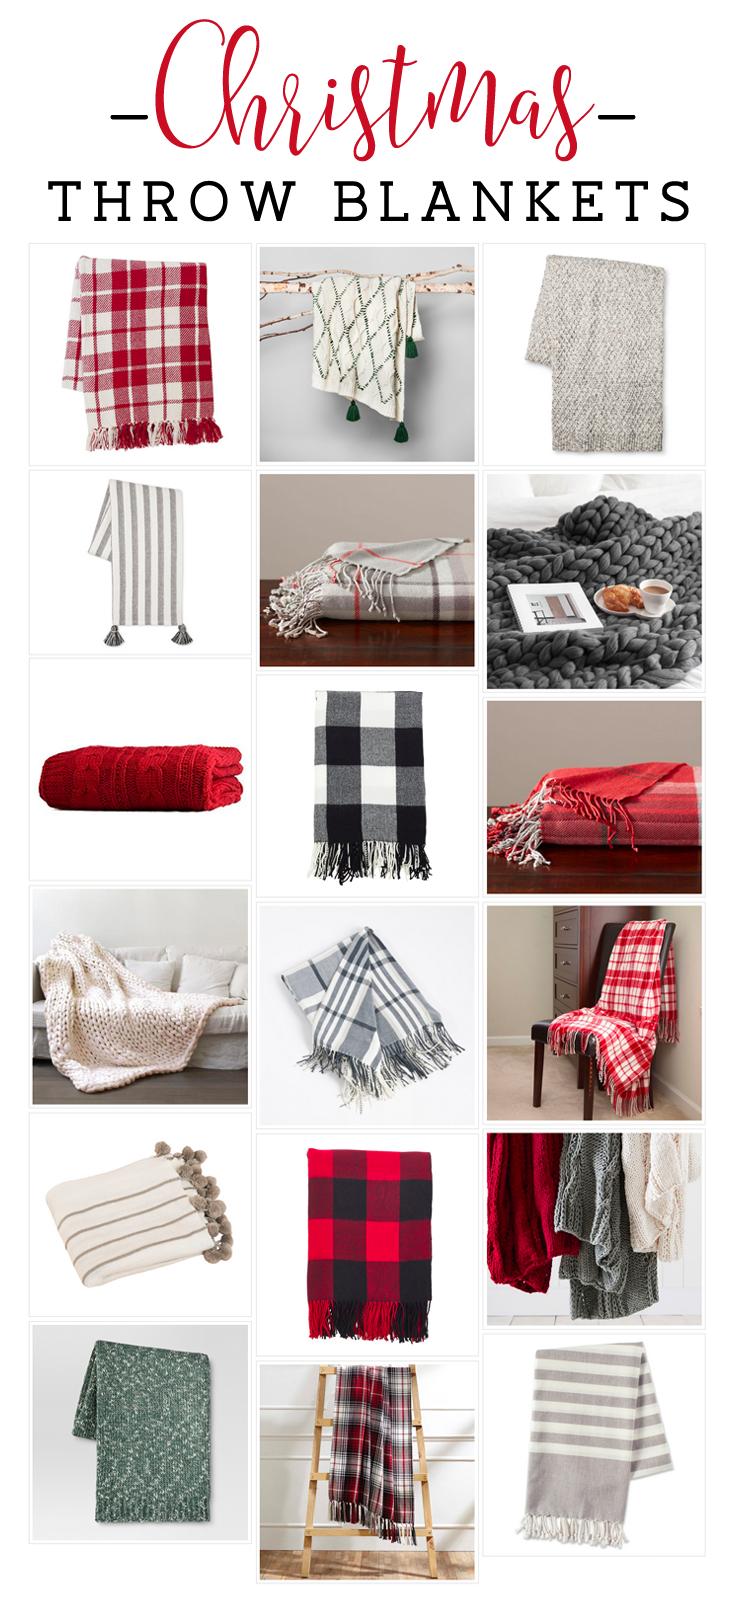 christmas throw blankets christmas throw blankets from amazon christmas throw blankets from target